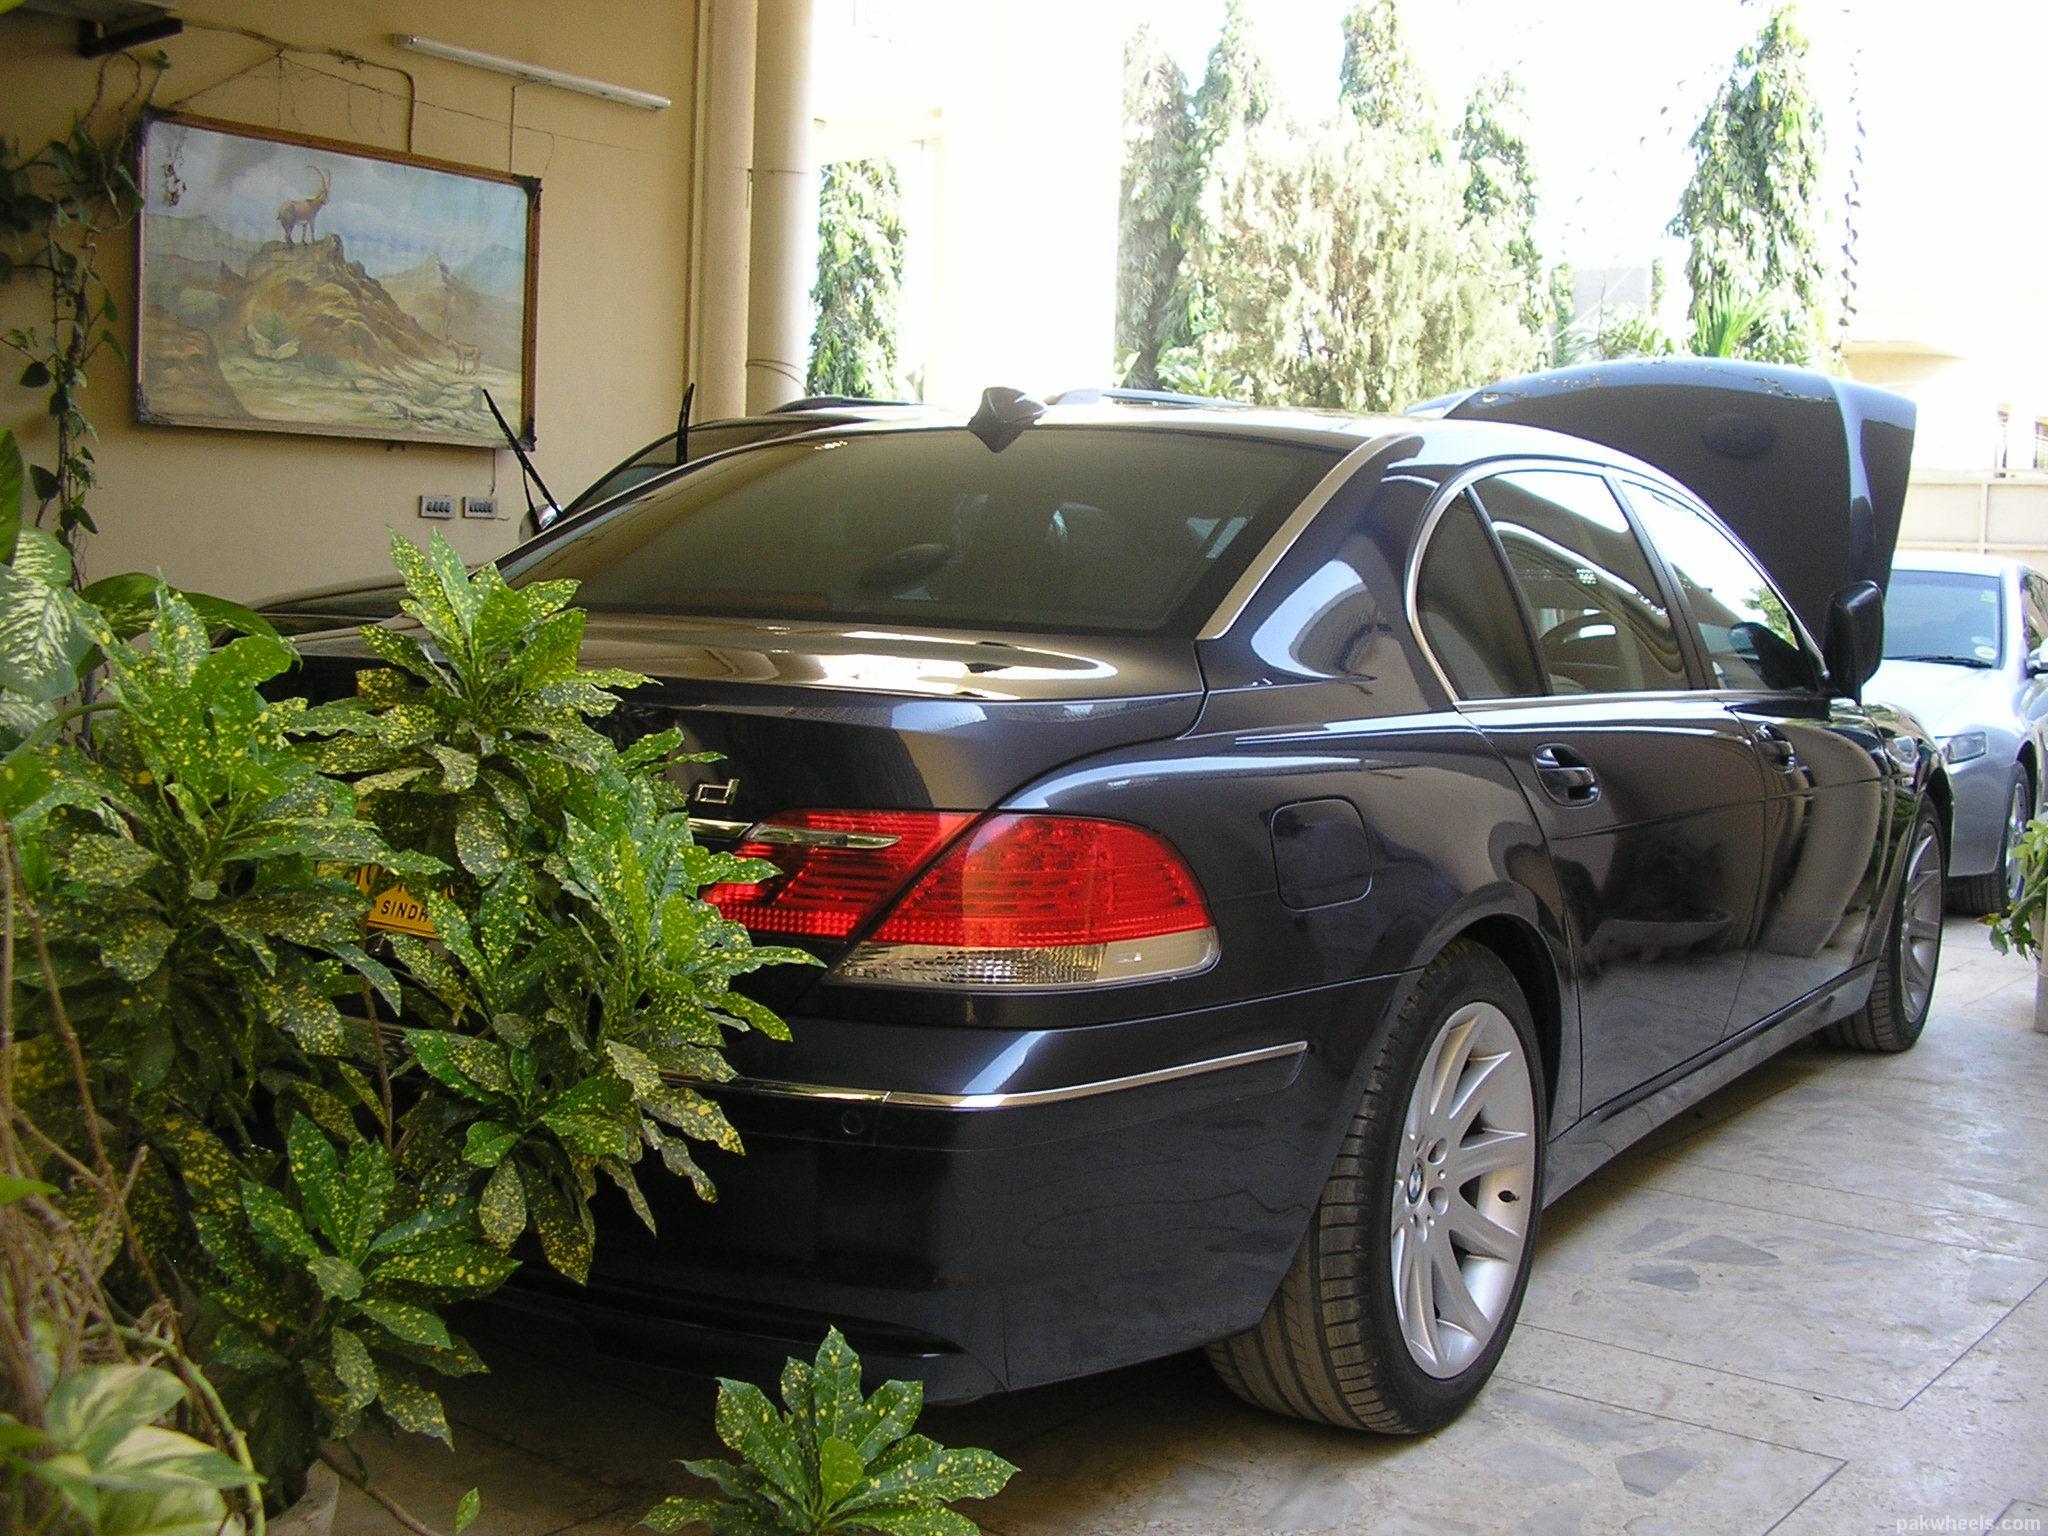 BMW 7 Series - 2008 - Image-1